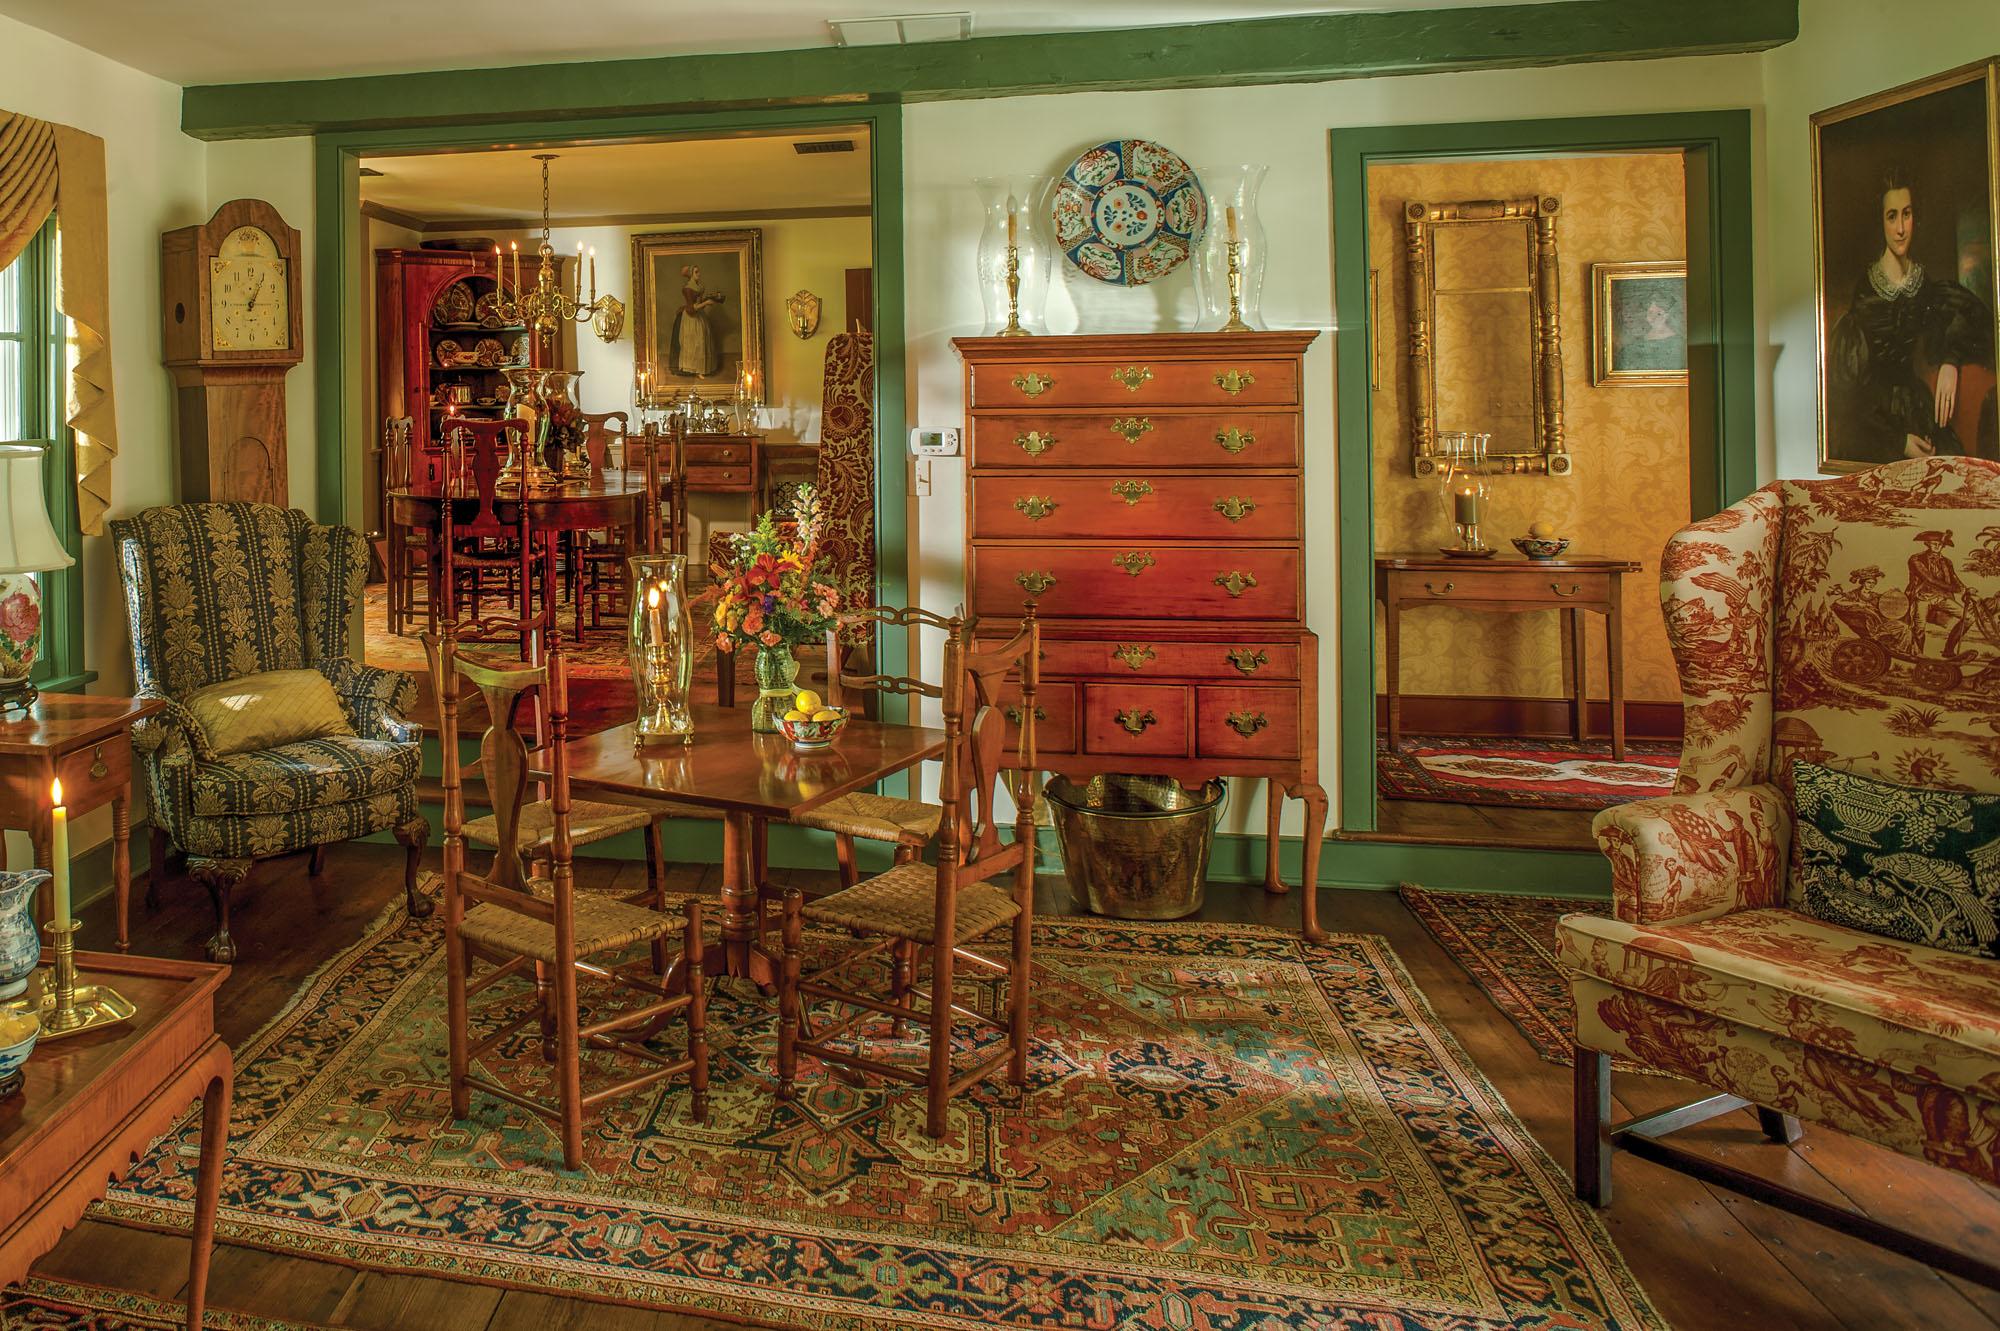 Colonial-era antiques